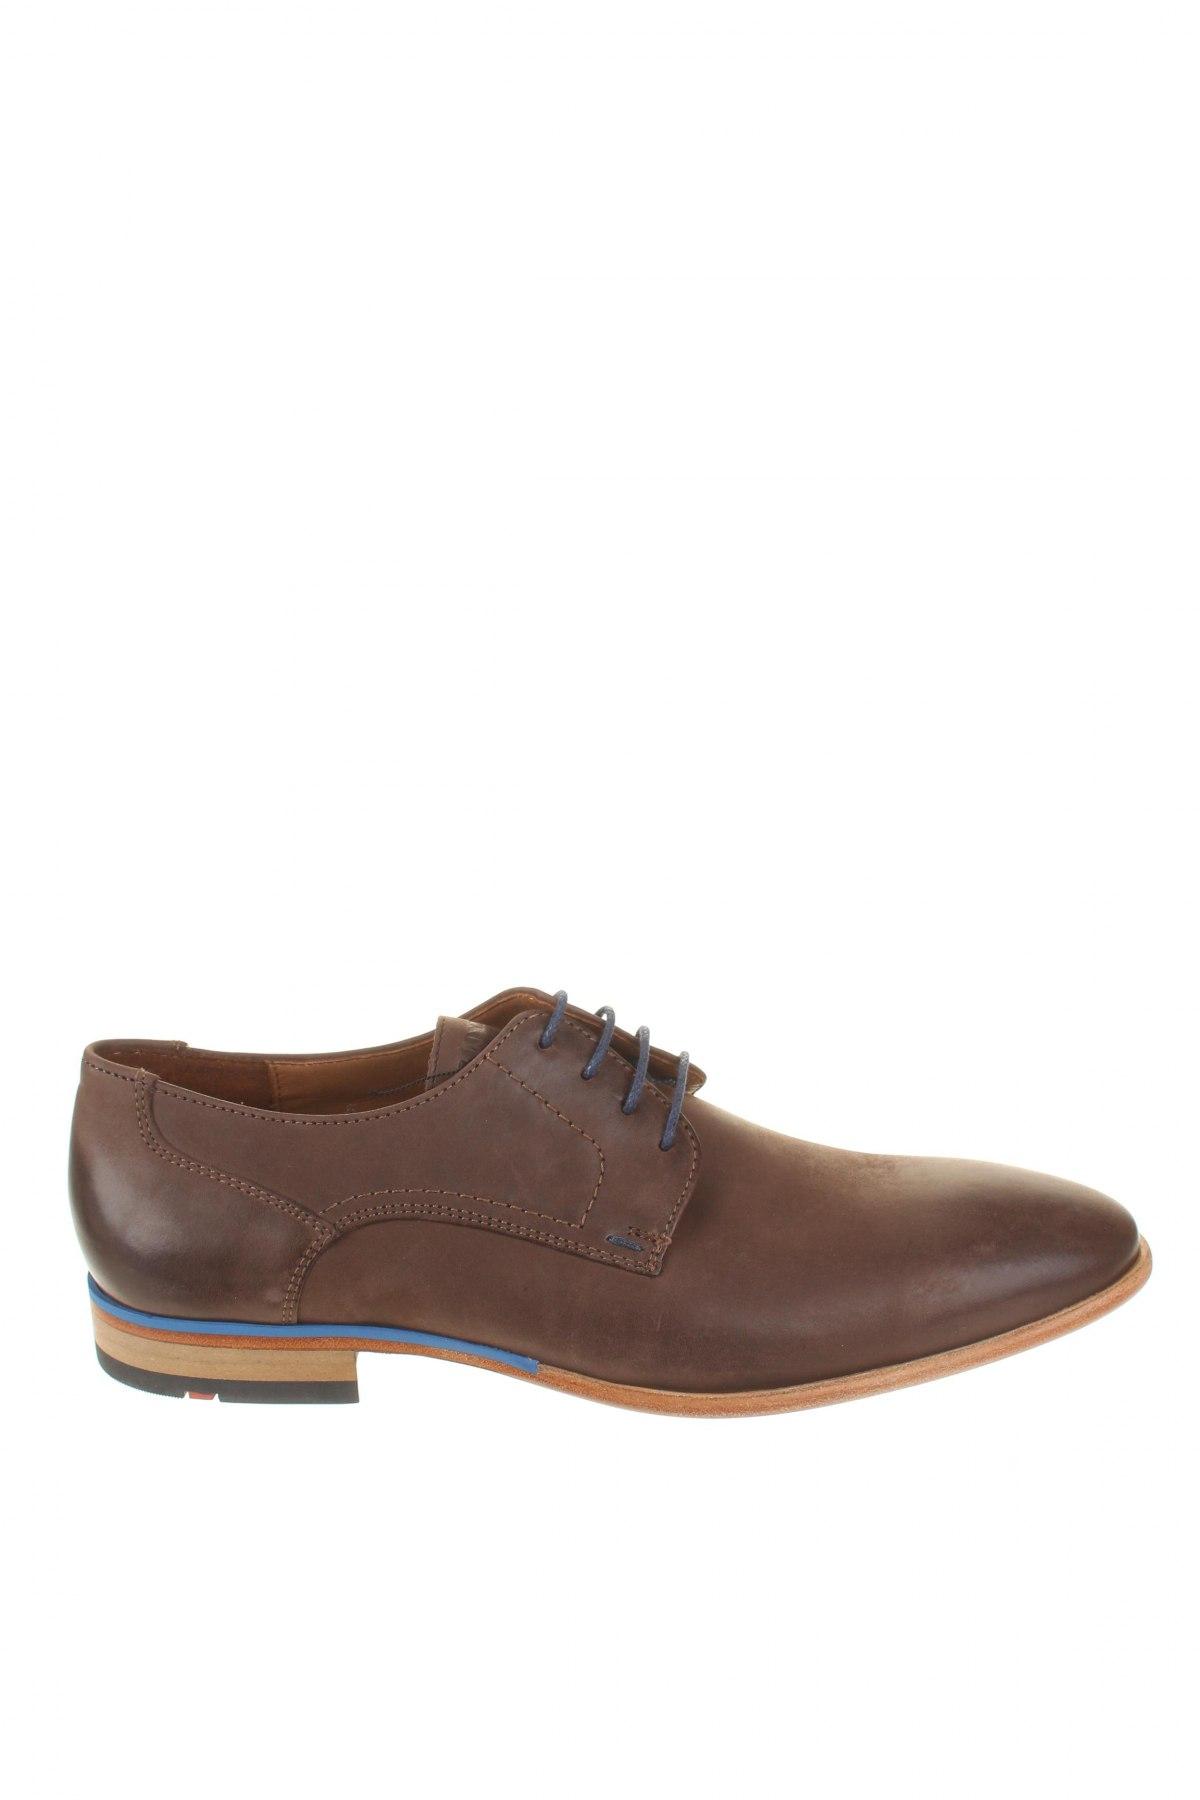 sports shoes bb0a2 4f7b2 Herrenschuhe Lloyd